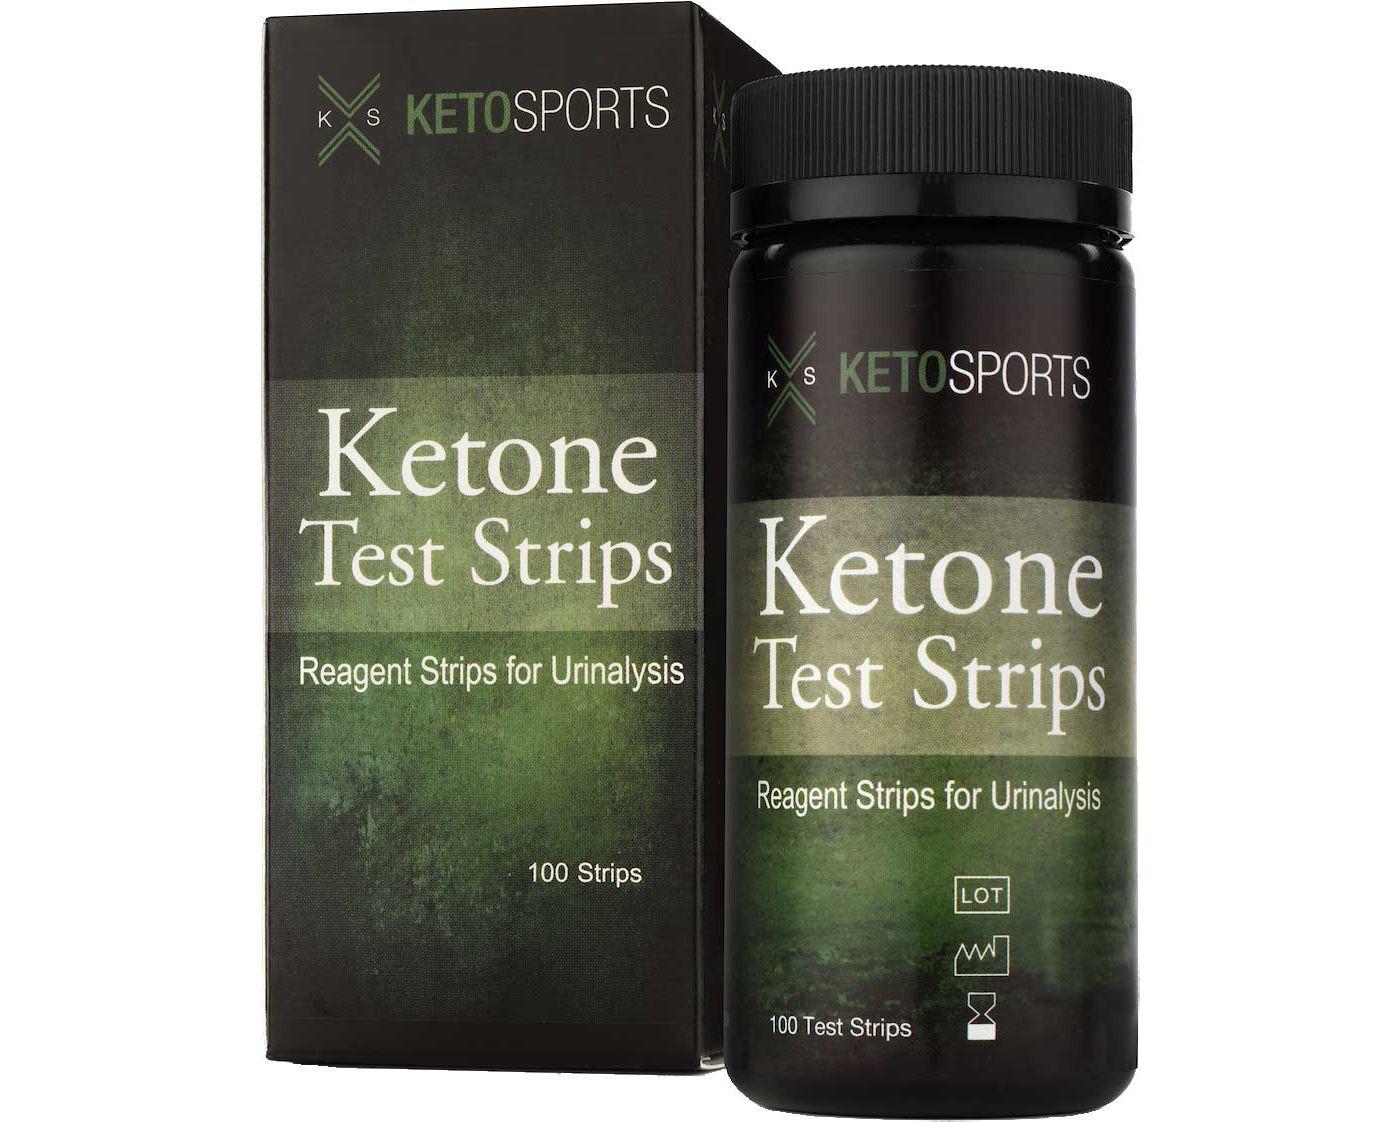 KetoSports Keto Test Strips